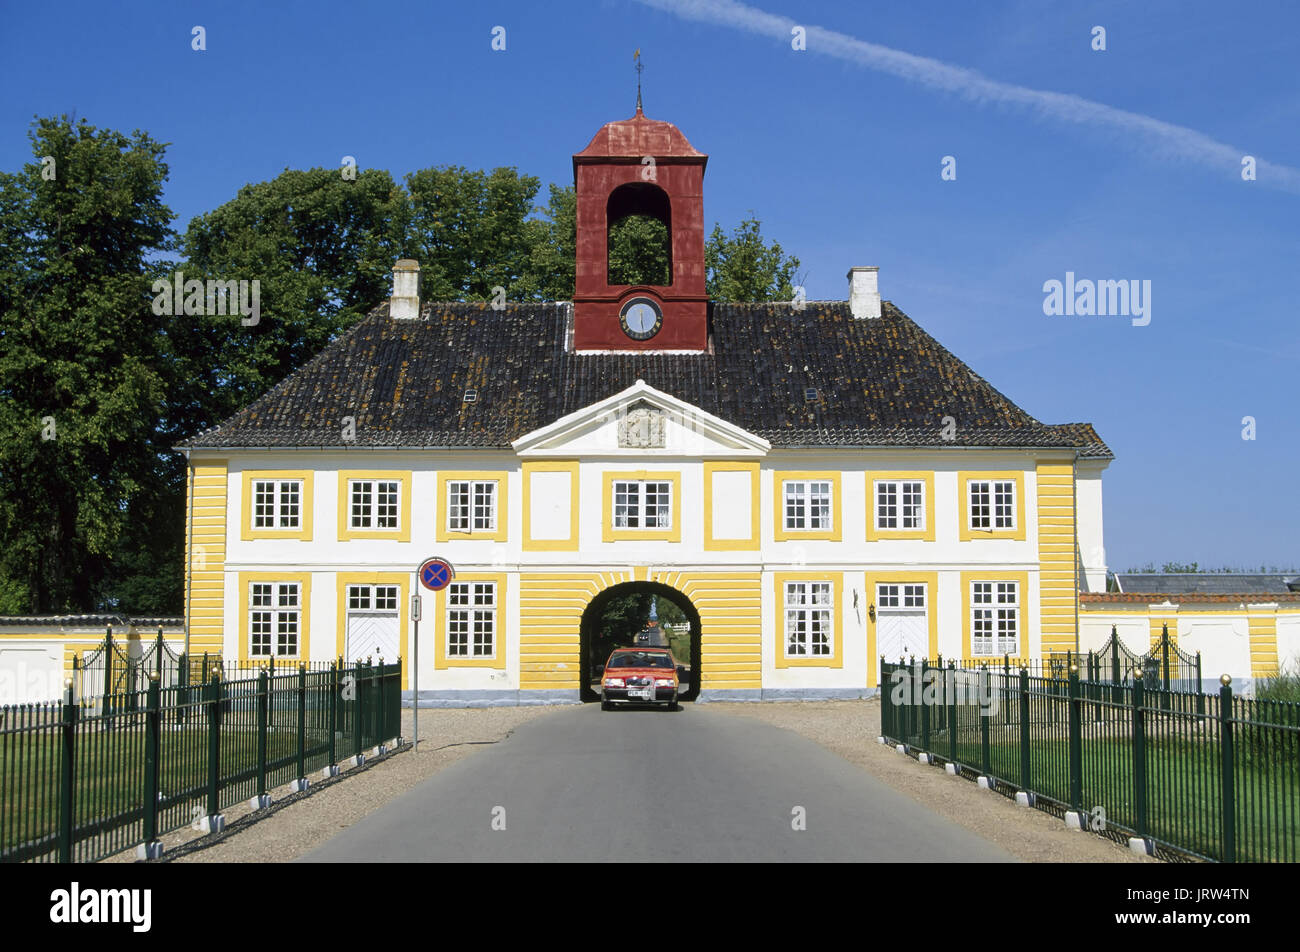 Gate house of Waldemars Slot on Tasinge island, Fyn, Denmark, Scandinavia, Europe Stock Photo